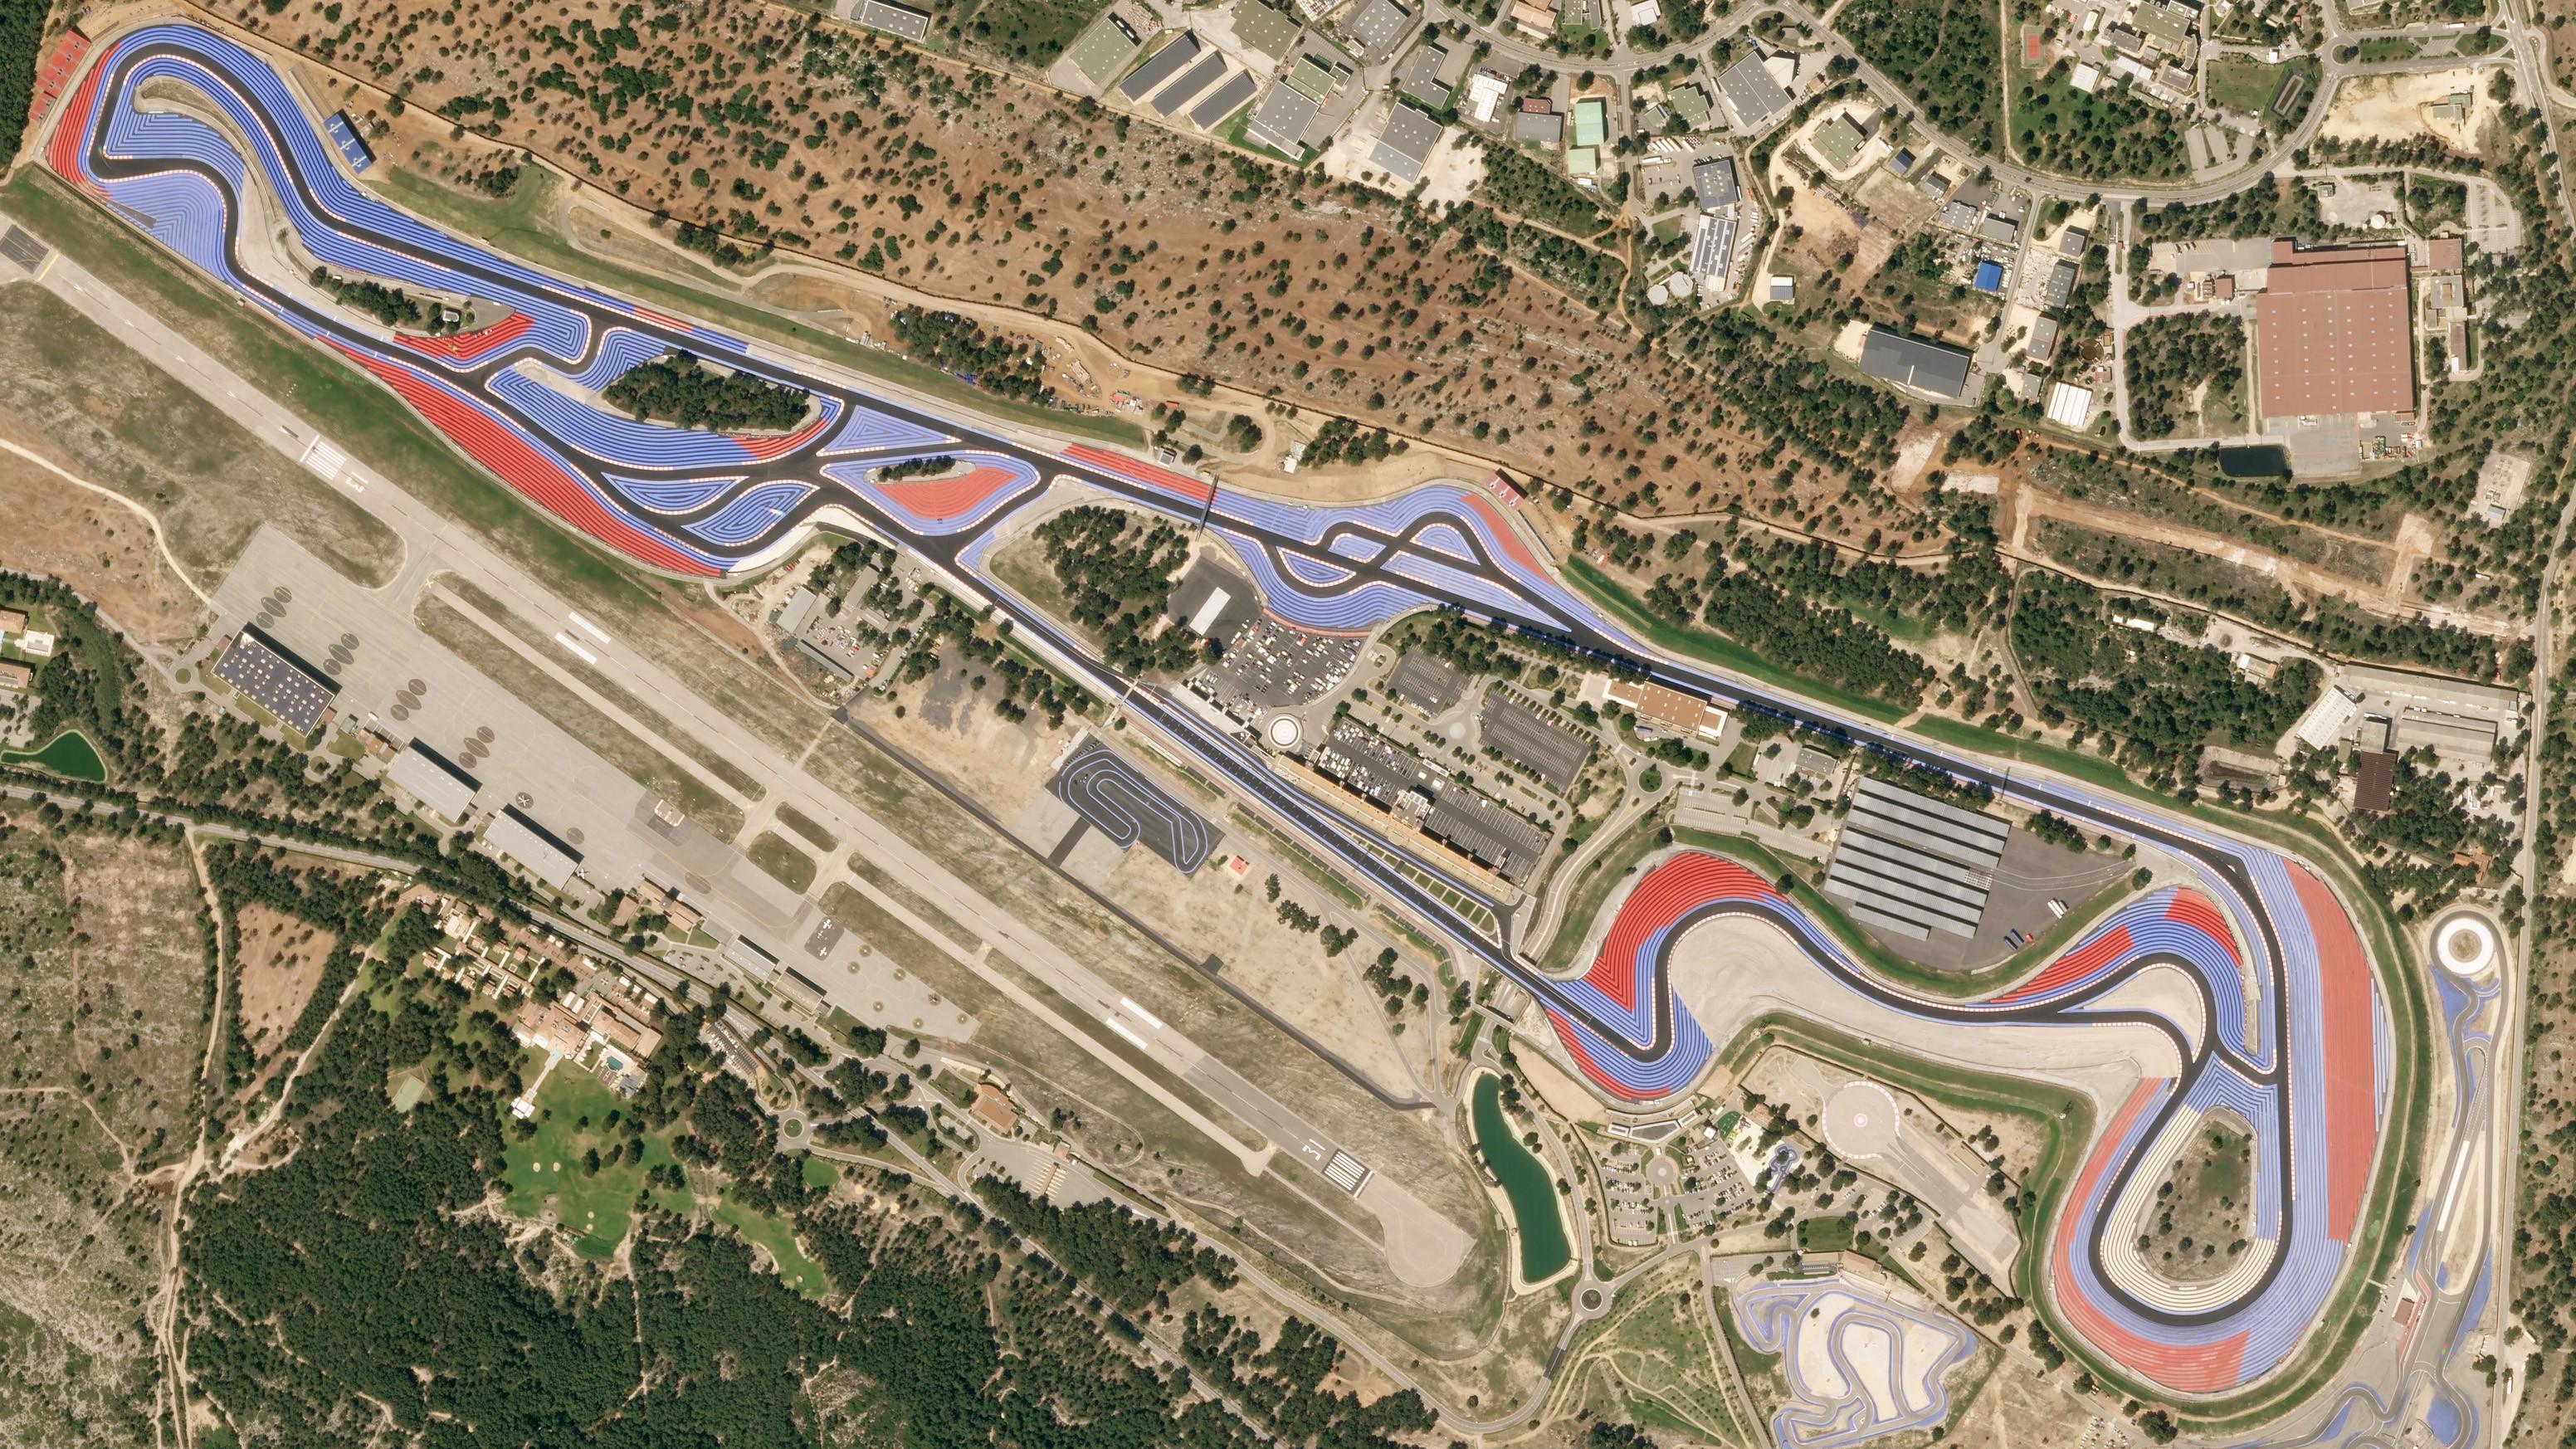 Circuit Paul Ricard >> Tiedosto Circuit Paul Ricard April 22 2018 Skysat Cropped